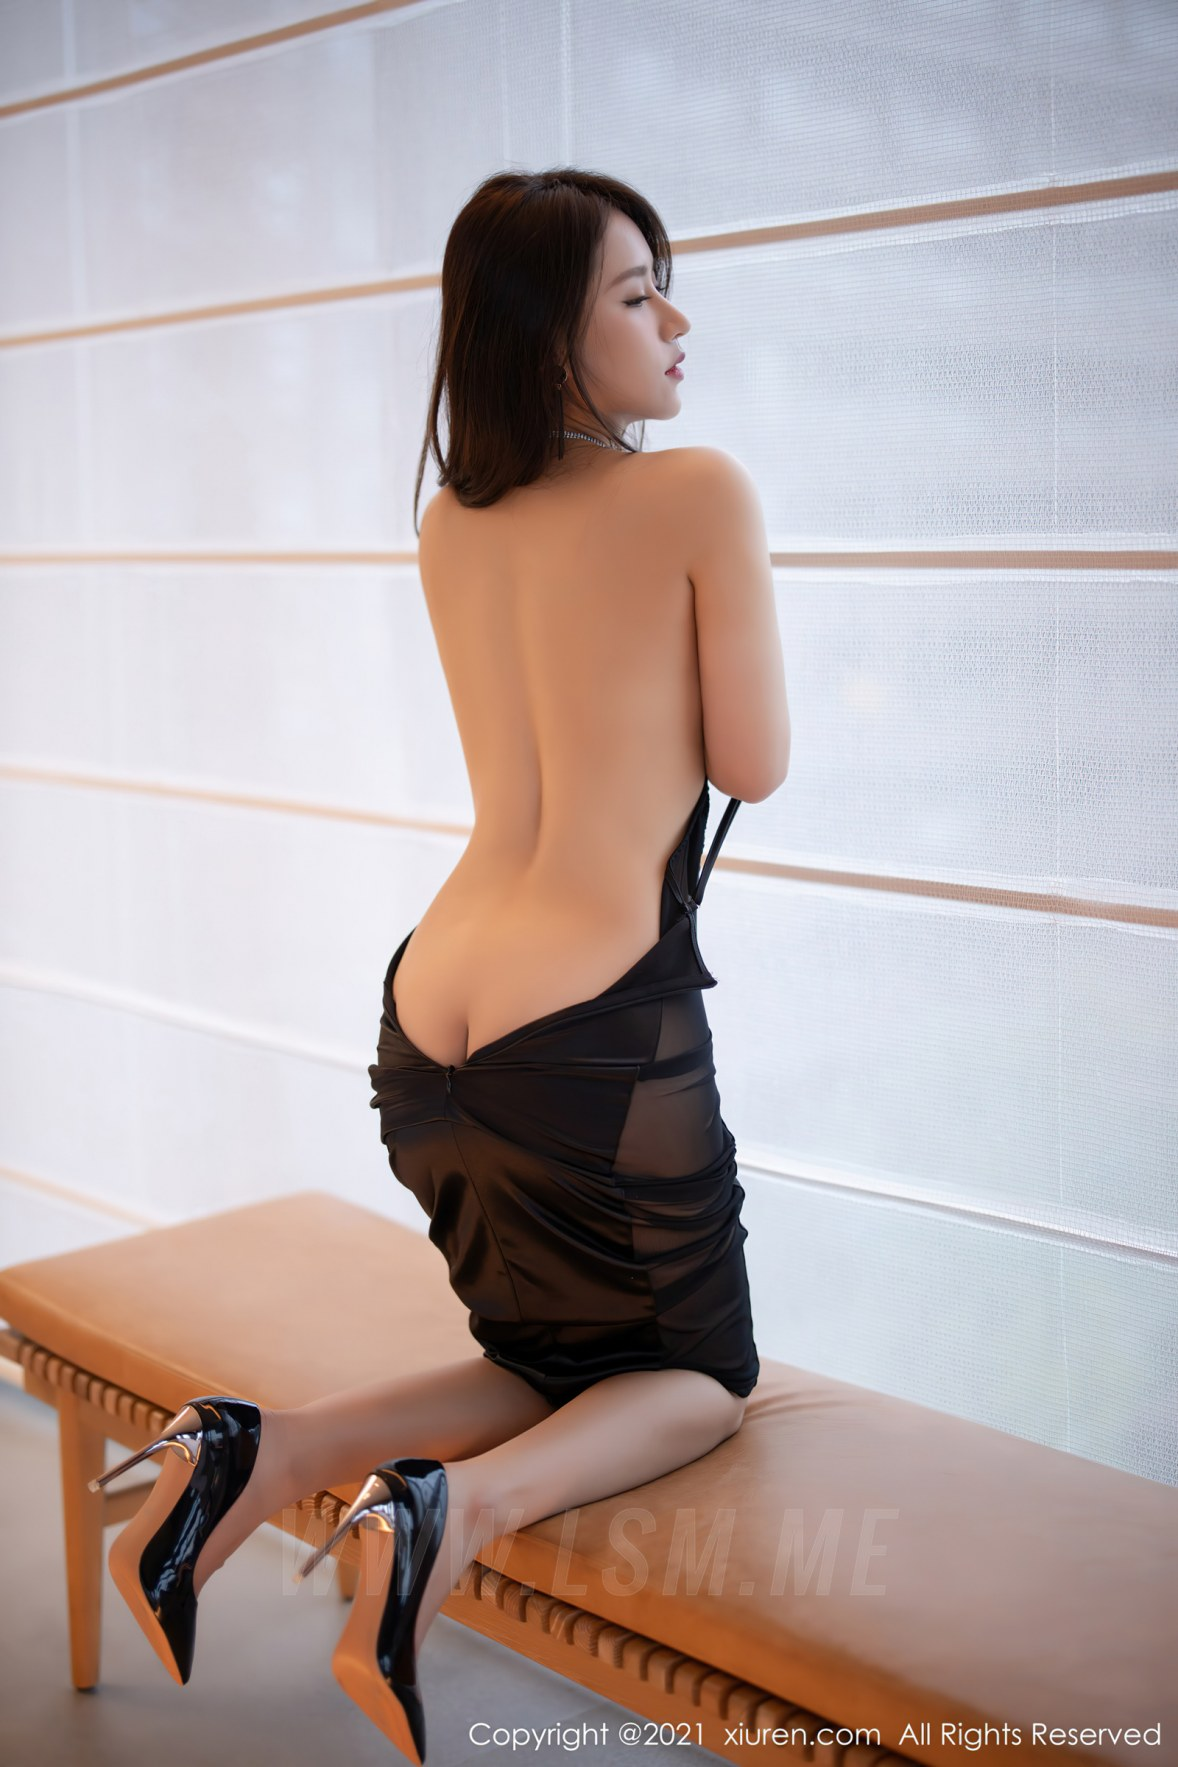 3465 028 uck 3600 5400 - XiuRen 秀人 No.3465  黑色吊裙 徐安安 三亚旅拍写真 - 秀人网 -【免费在线写真】【丽人丝语】